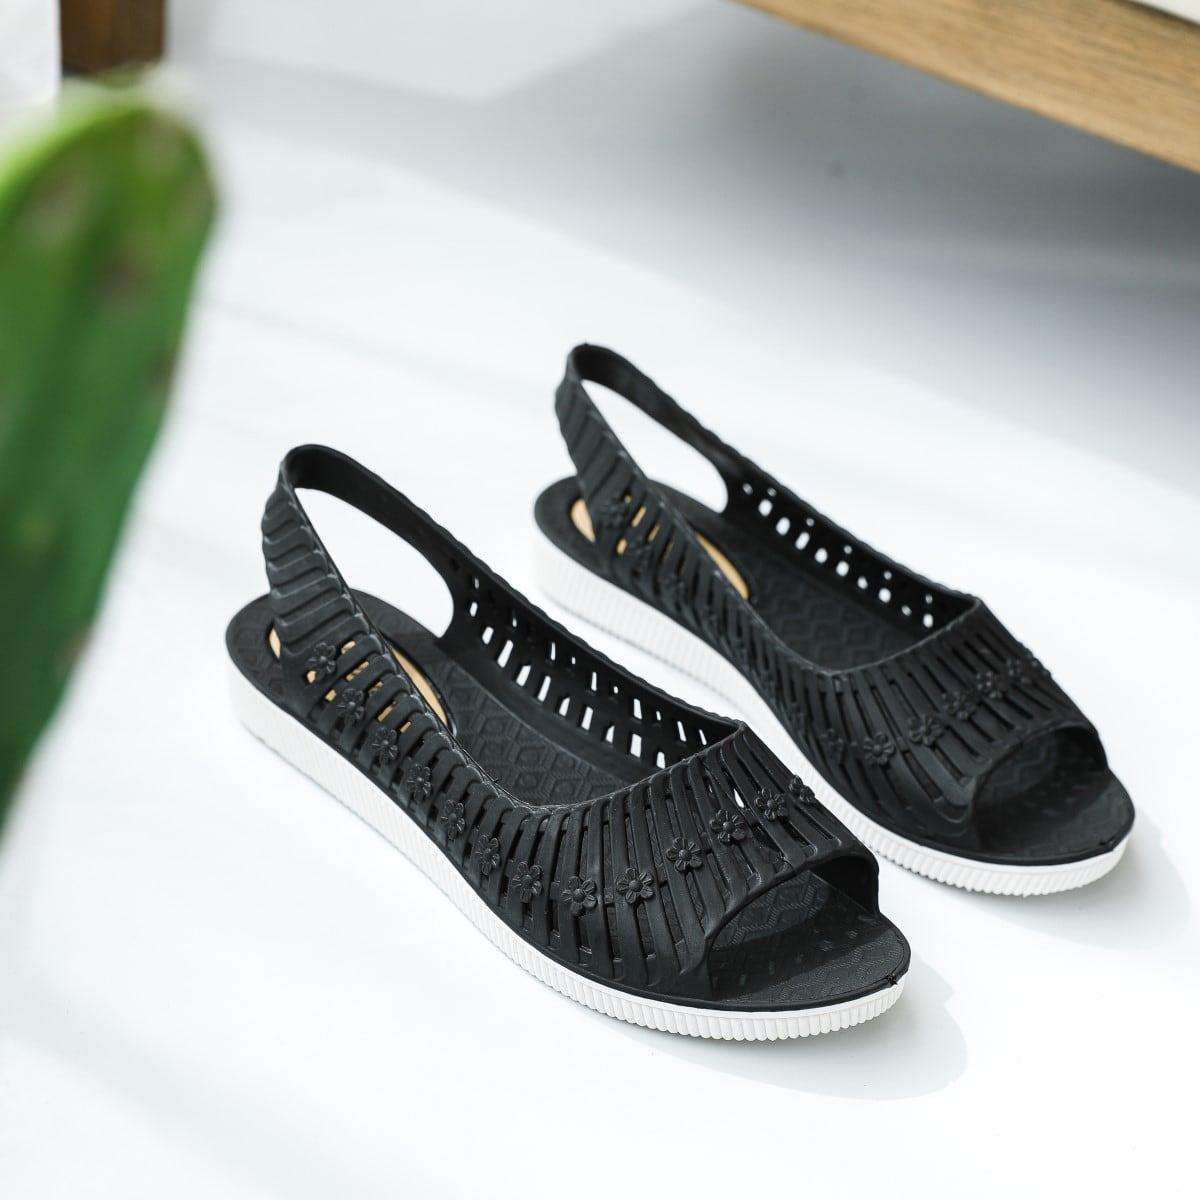 SHEIN / Open Toe Flat Slingback Sandals